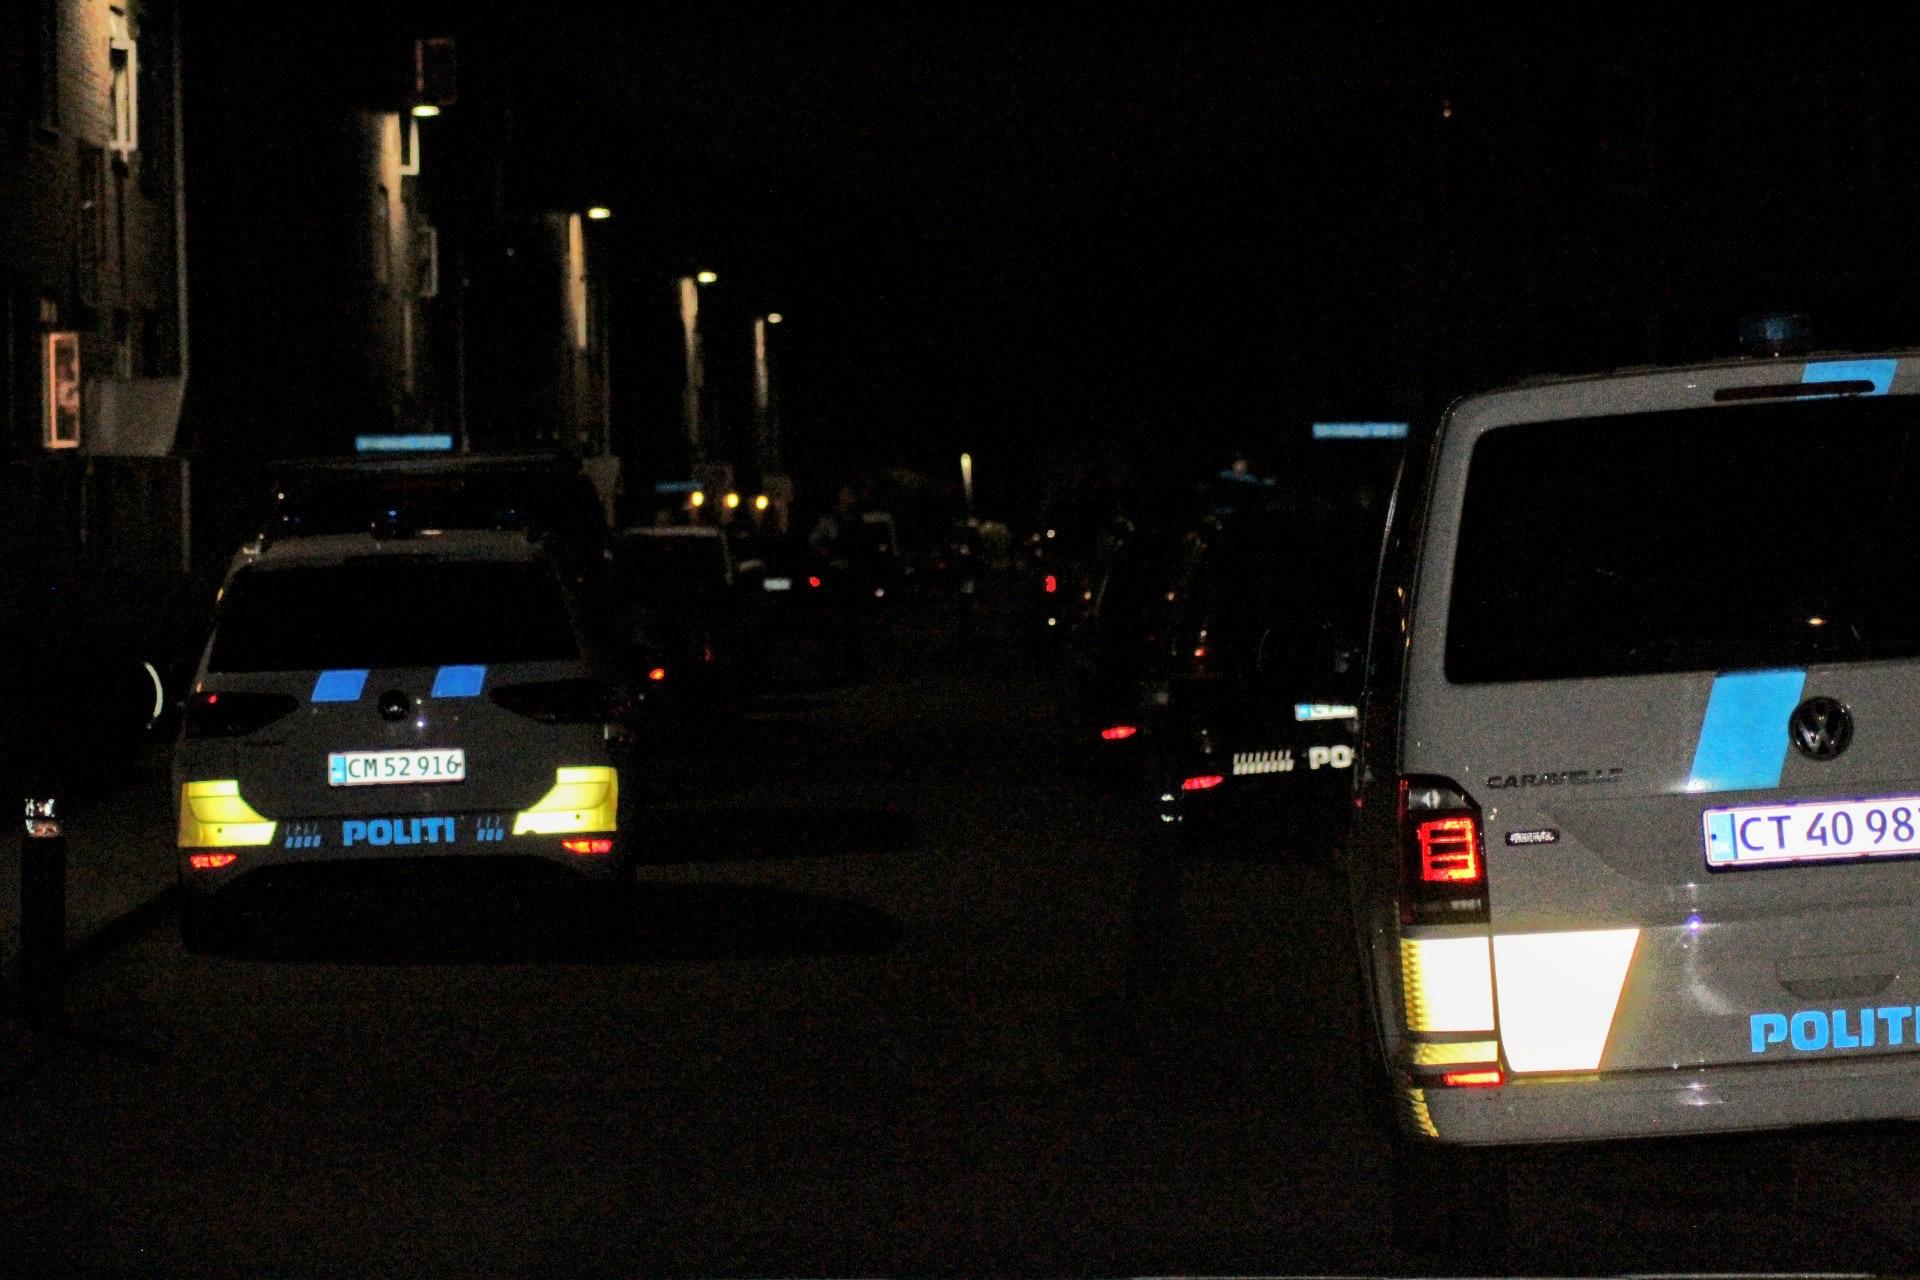 Større politiaktion i Valby